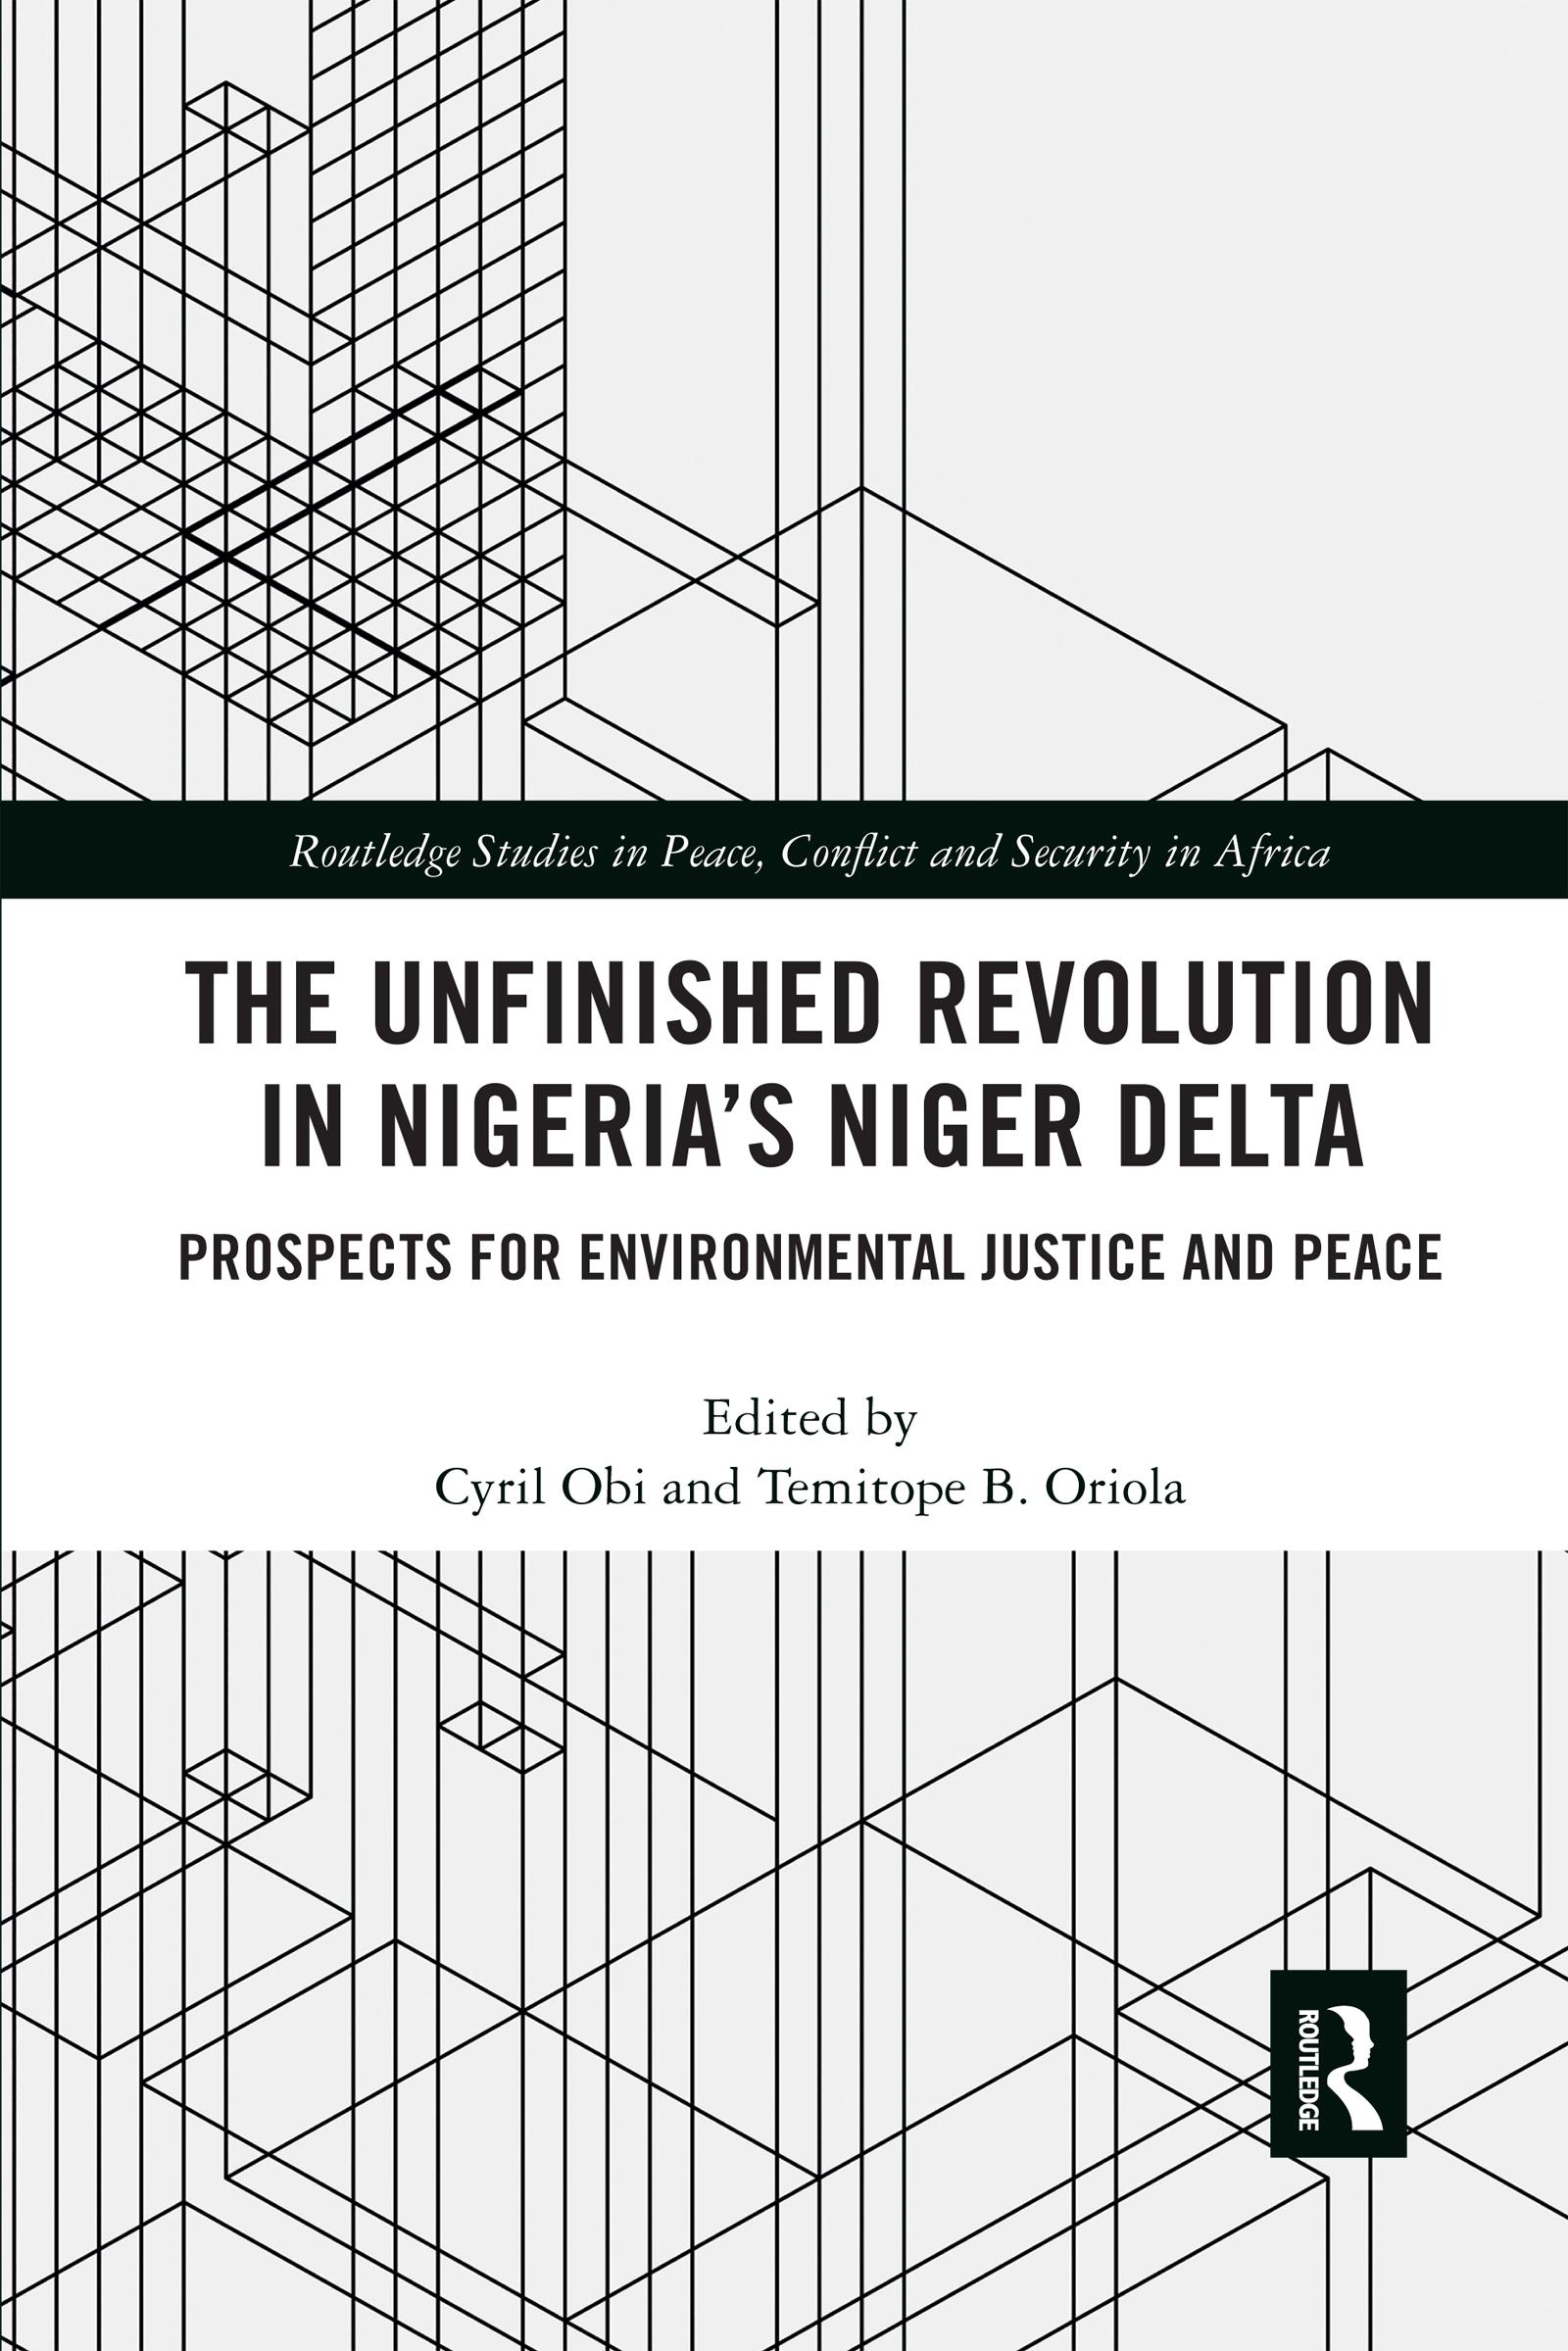 The Unfinished Revolution in Nigeria's Niger Delta